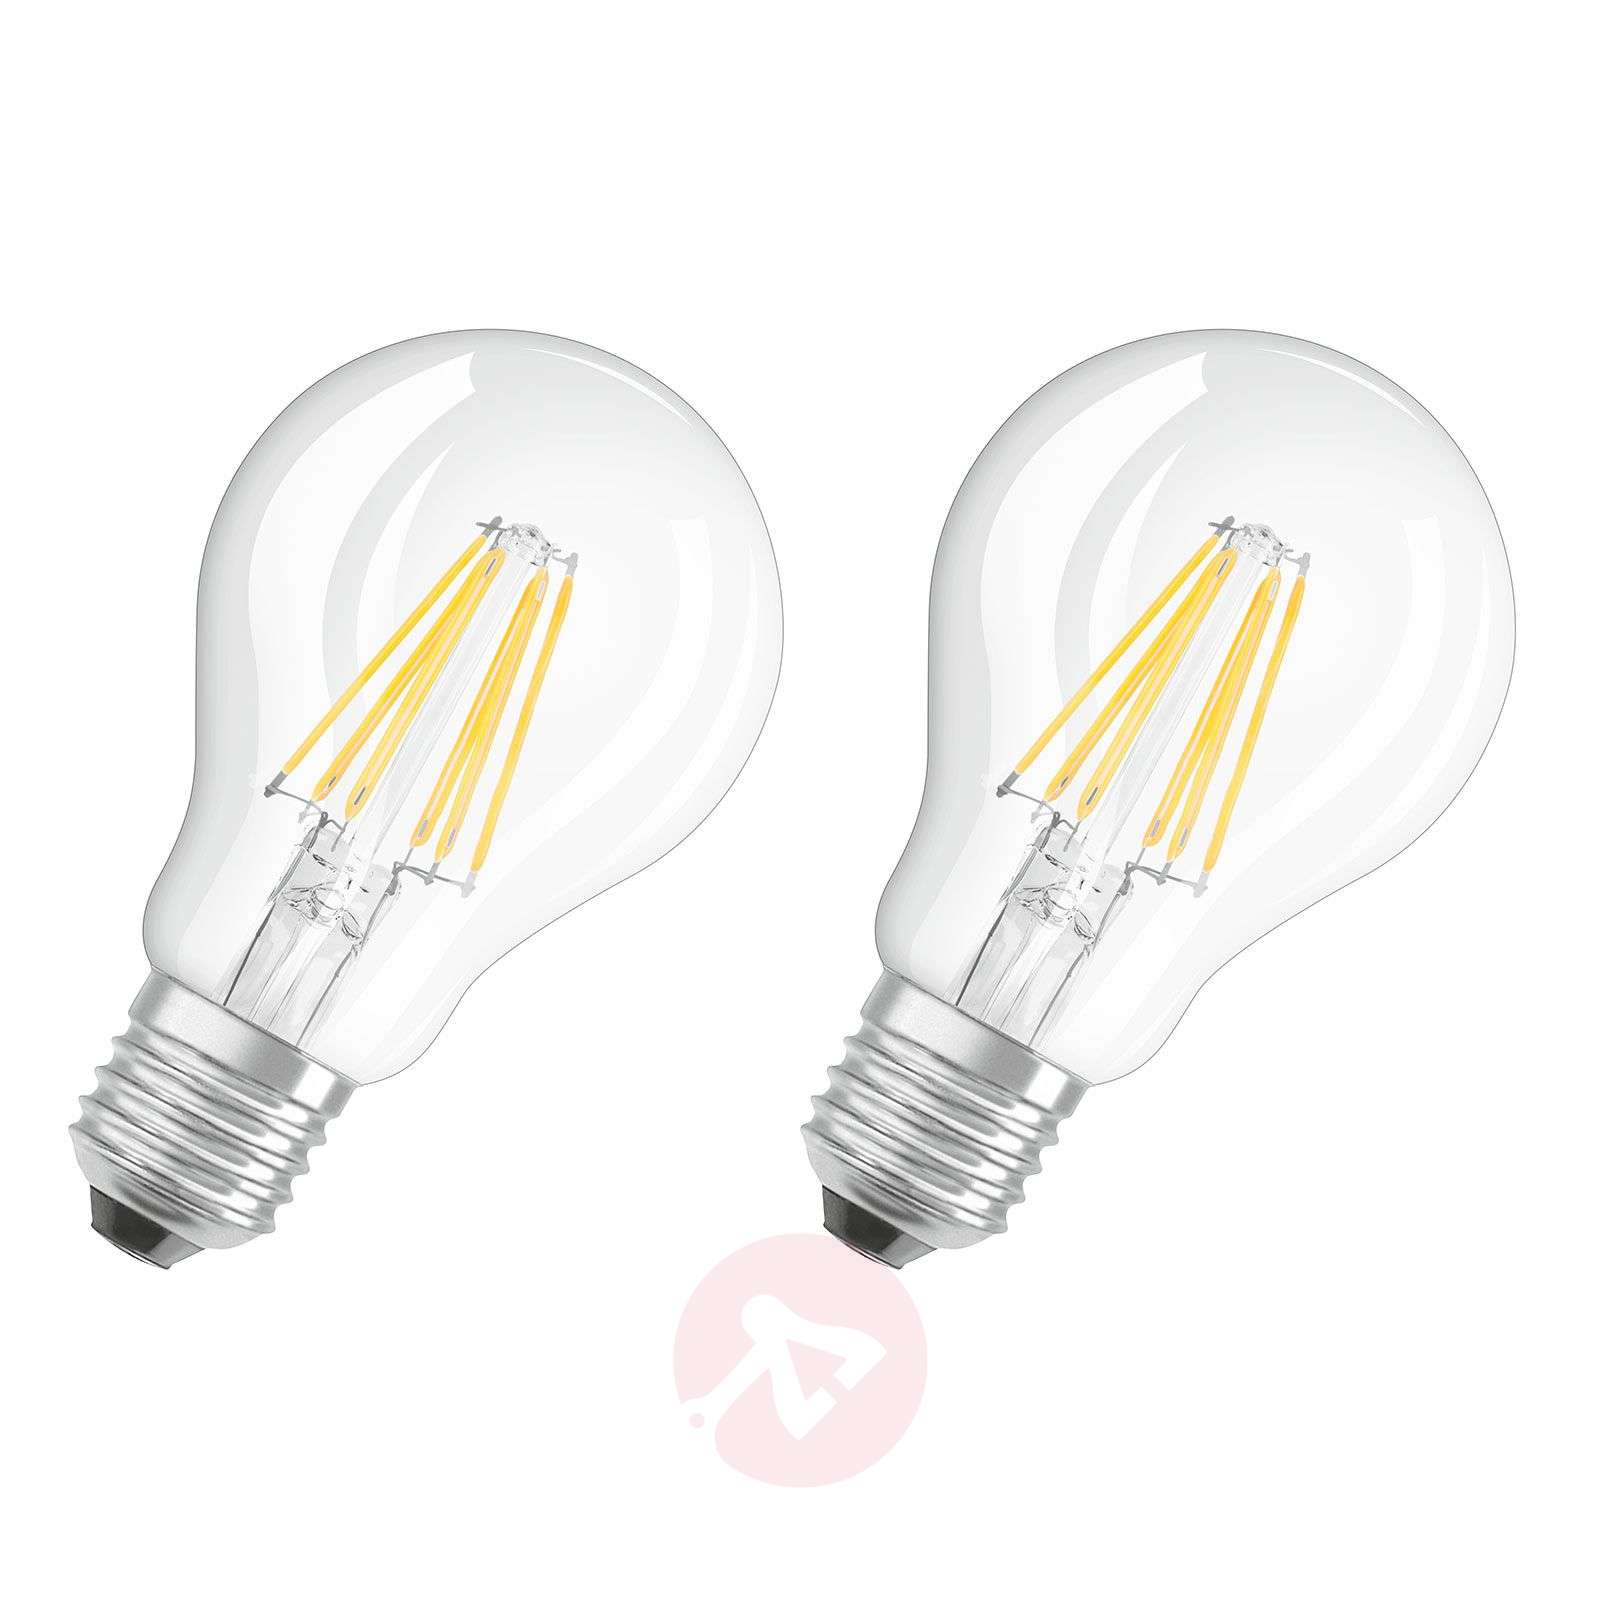 E27 7W 827 filament LED bulb, set of two-7260965-03